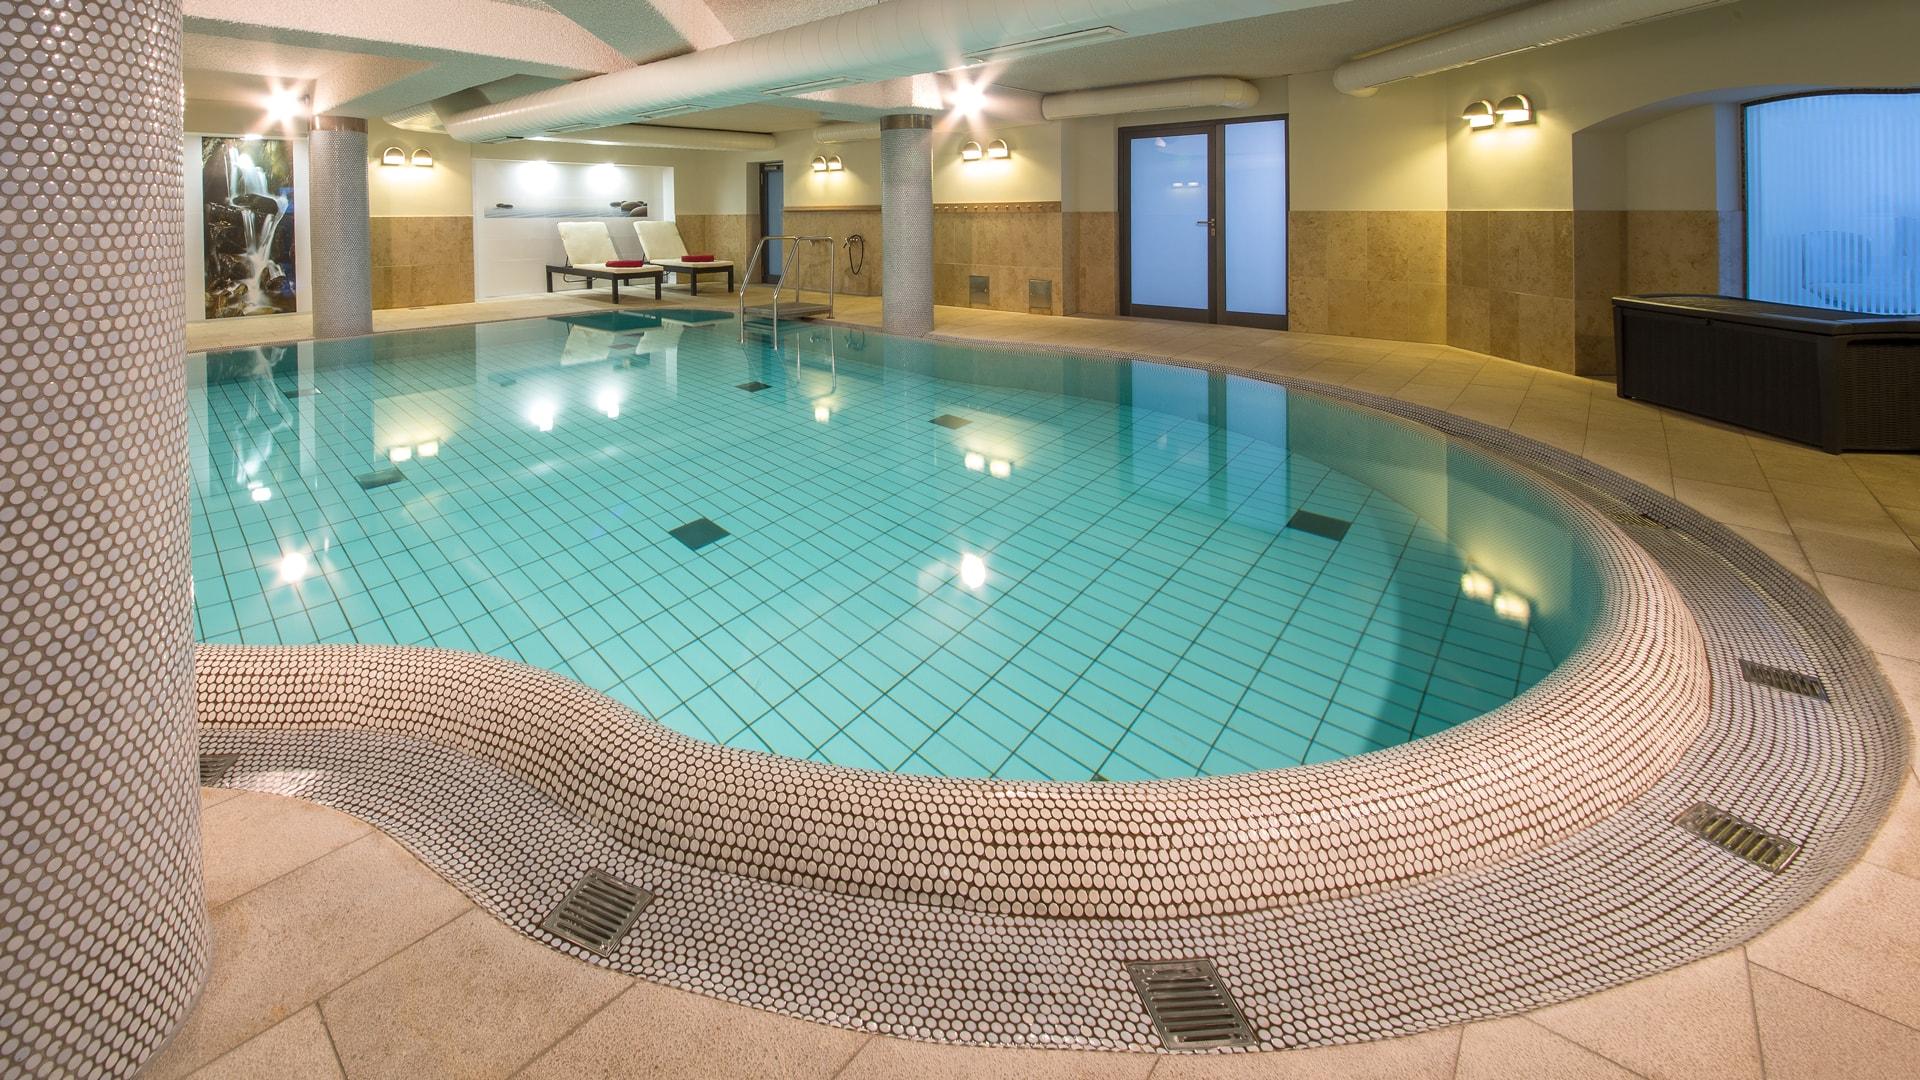 6 Michels_Hotels_Strandhotel_Germania_Wellnessbereich_Pool